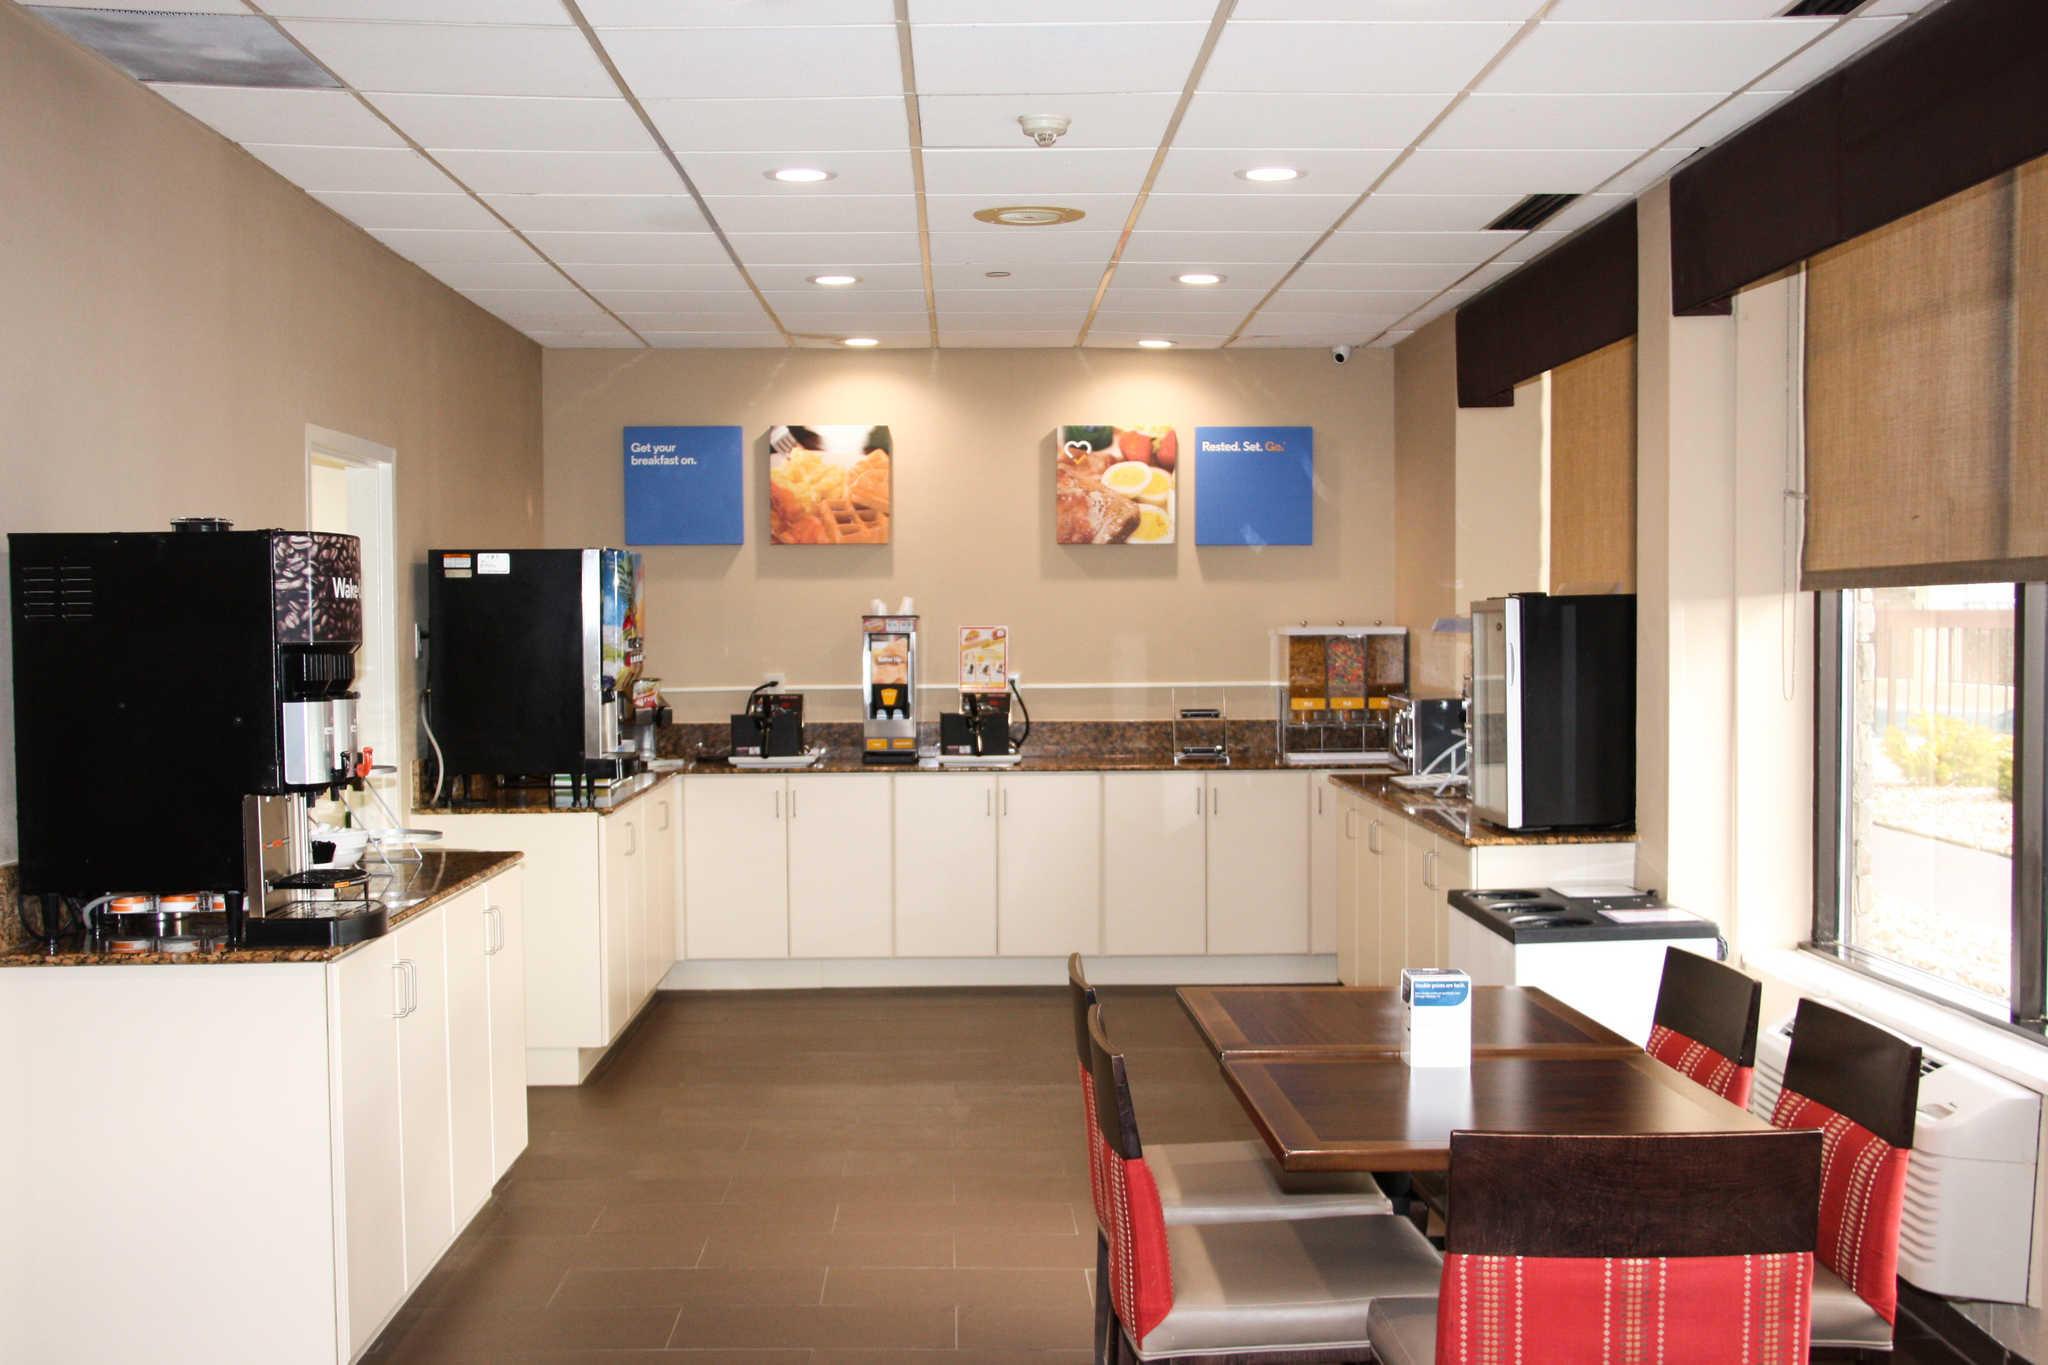 Comfort Inn & Suites Duke University-Downtown image 27